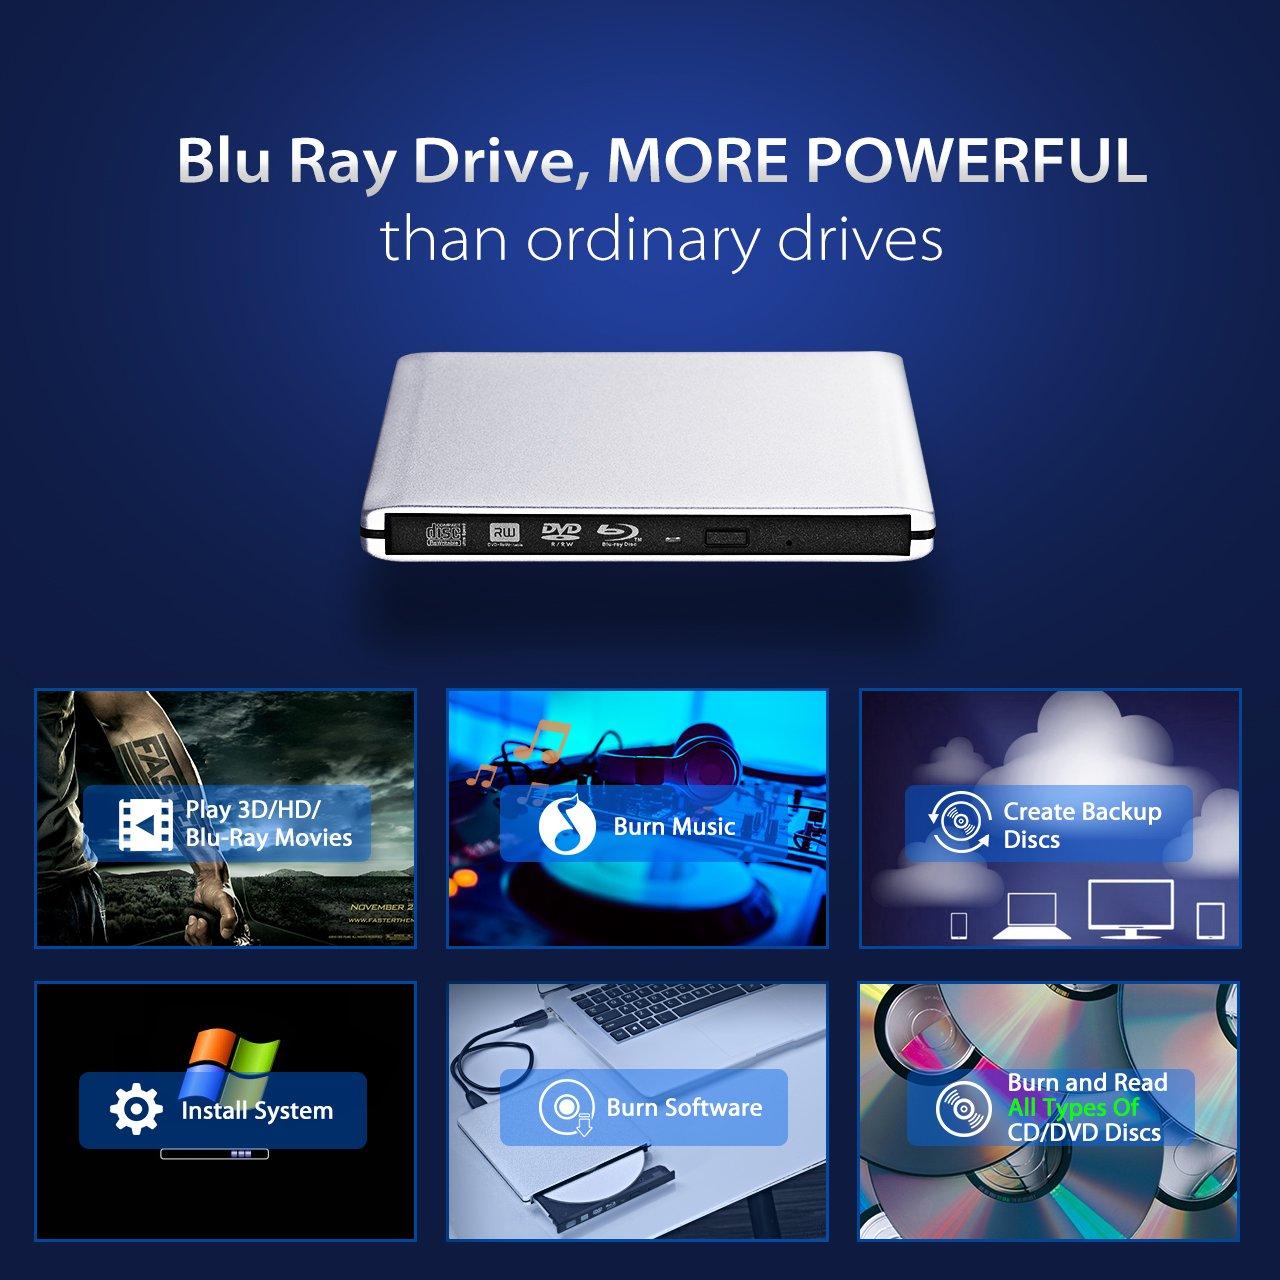 Amazon.com: 4K External Blu Ray Drive, TOPELEK USB3.0 Hard CD/DVD Burner/Writer, 3D 6X Blu-Ray Disc Playback, Slim & Super-Fast for Windows, Mac OS Laptop, ...